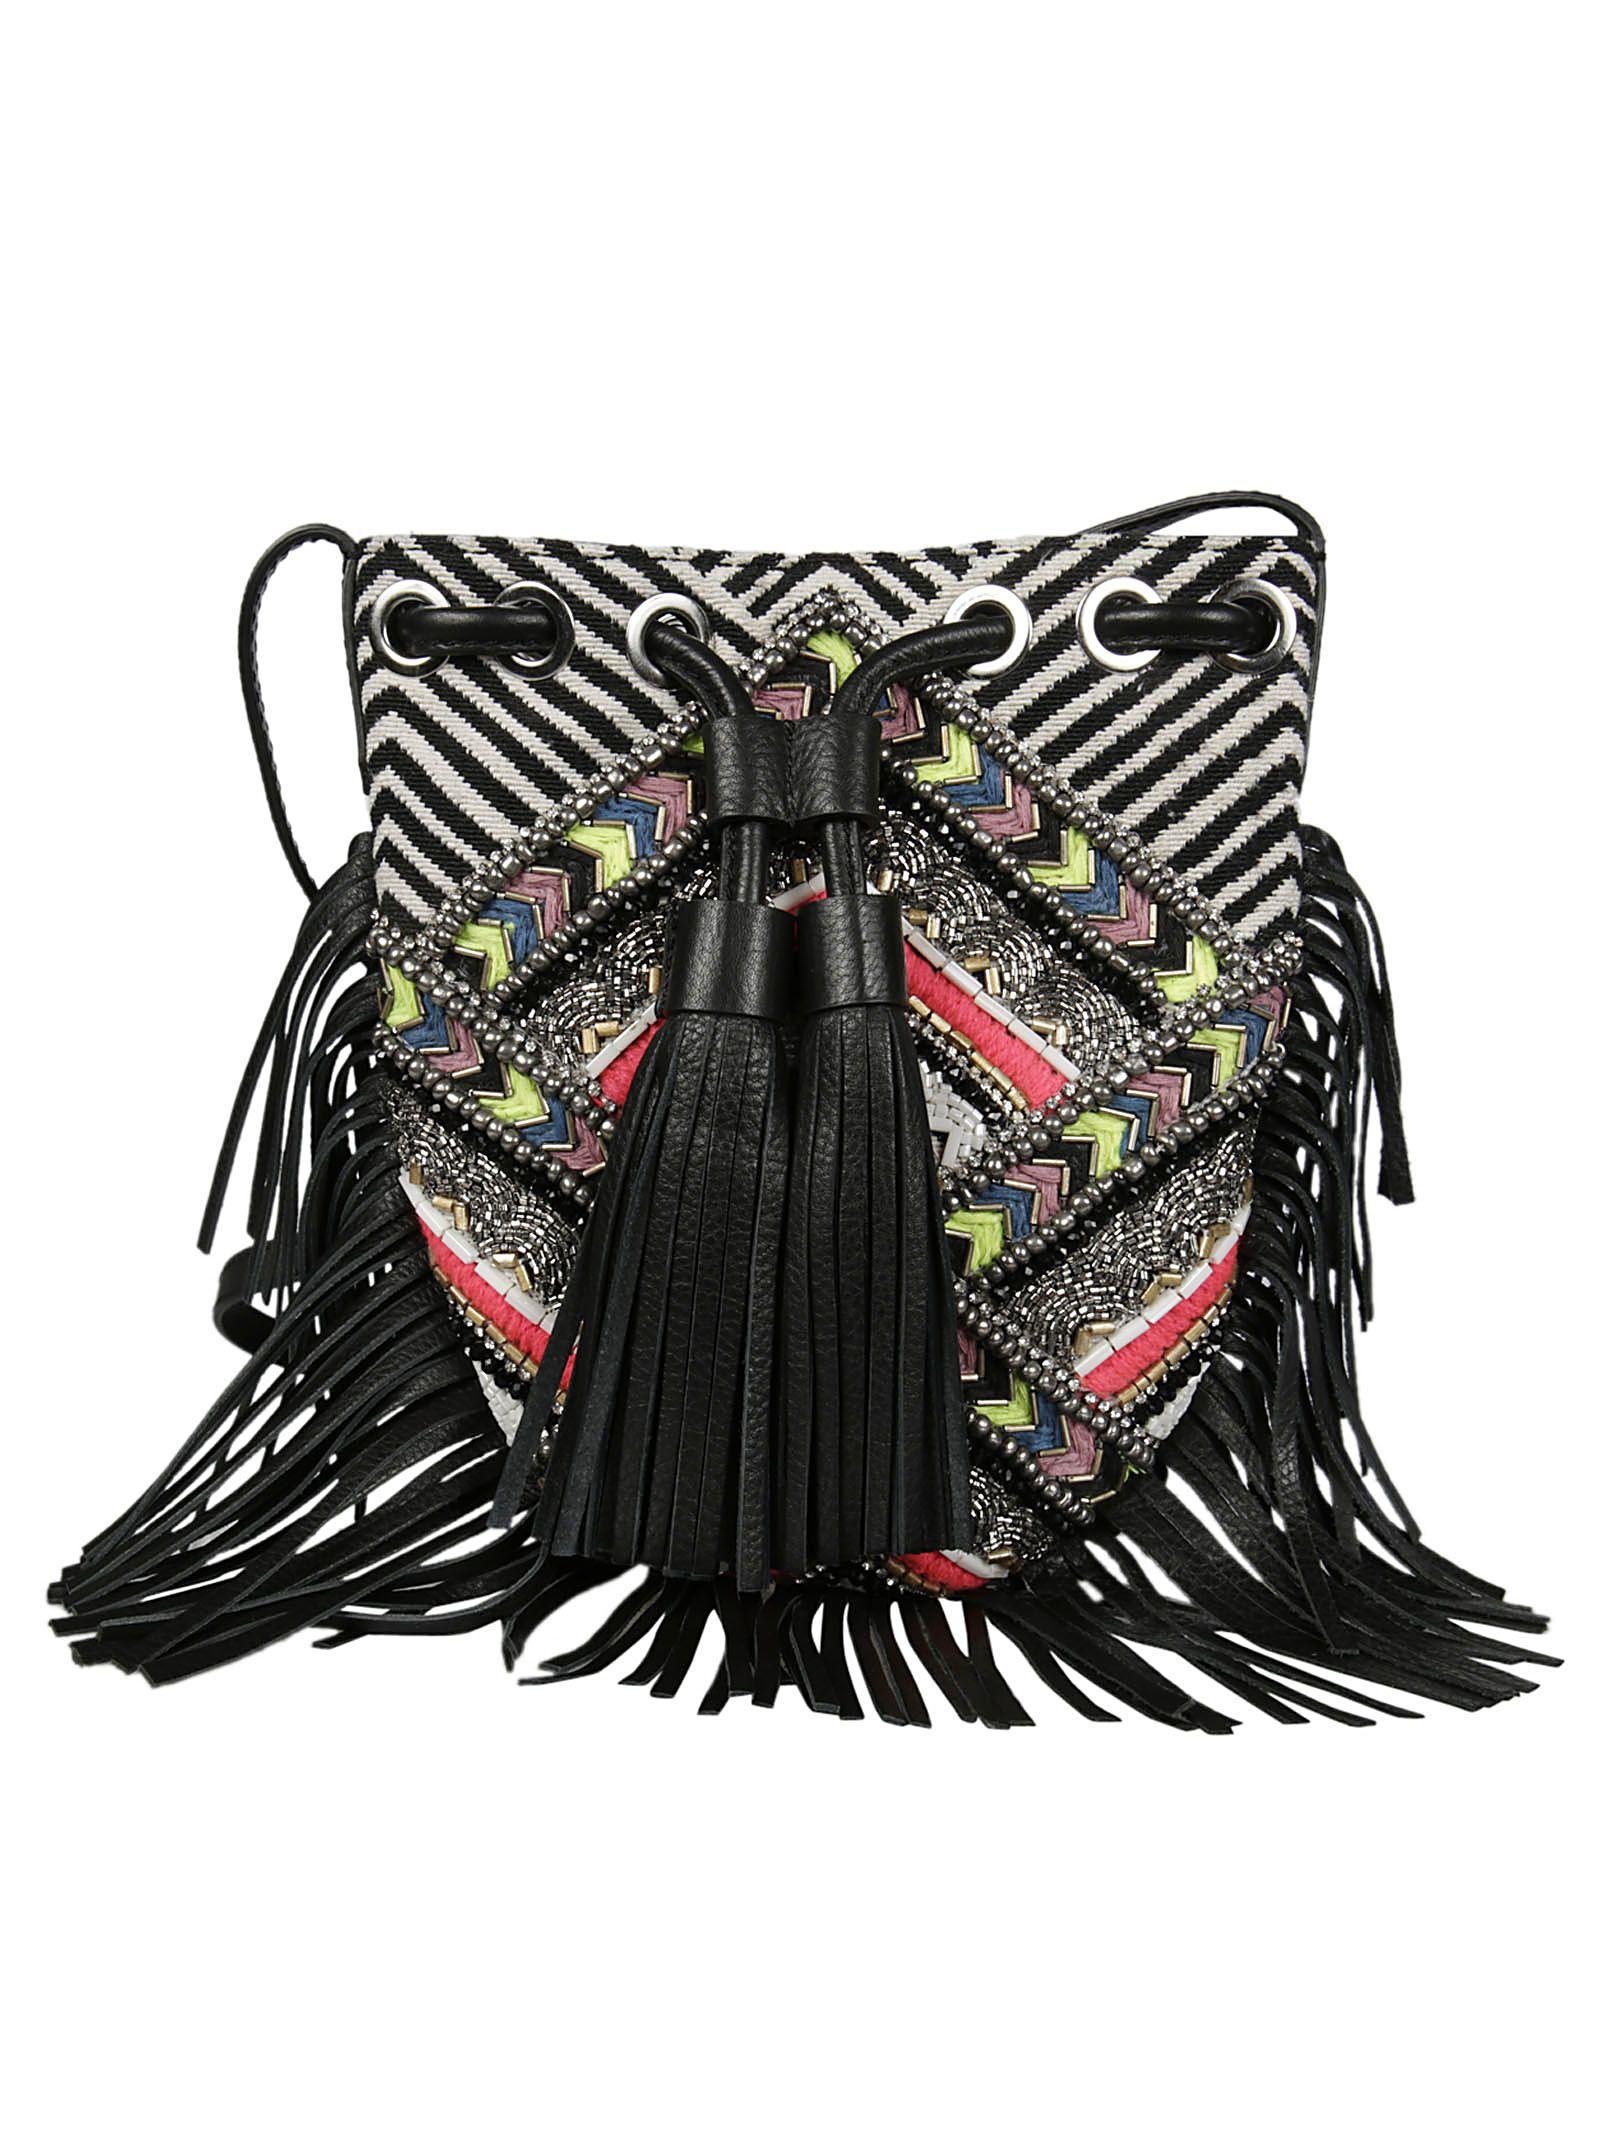 Rebecca Minkoff Wonder Phone Crossbody Bag